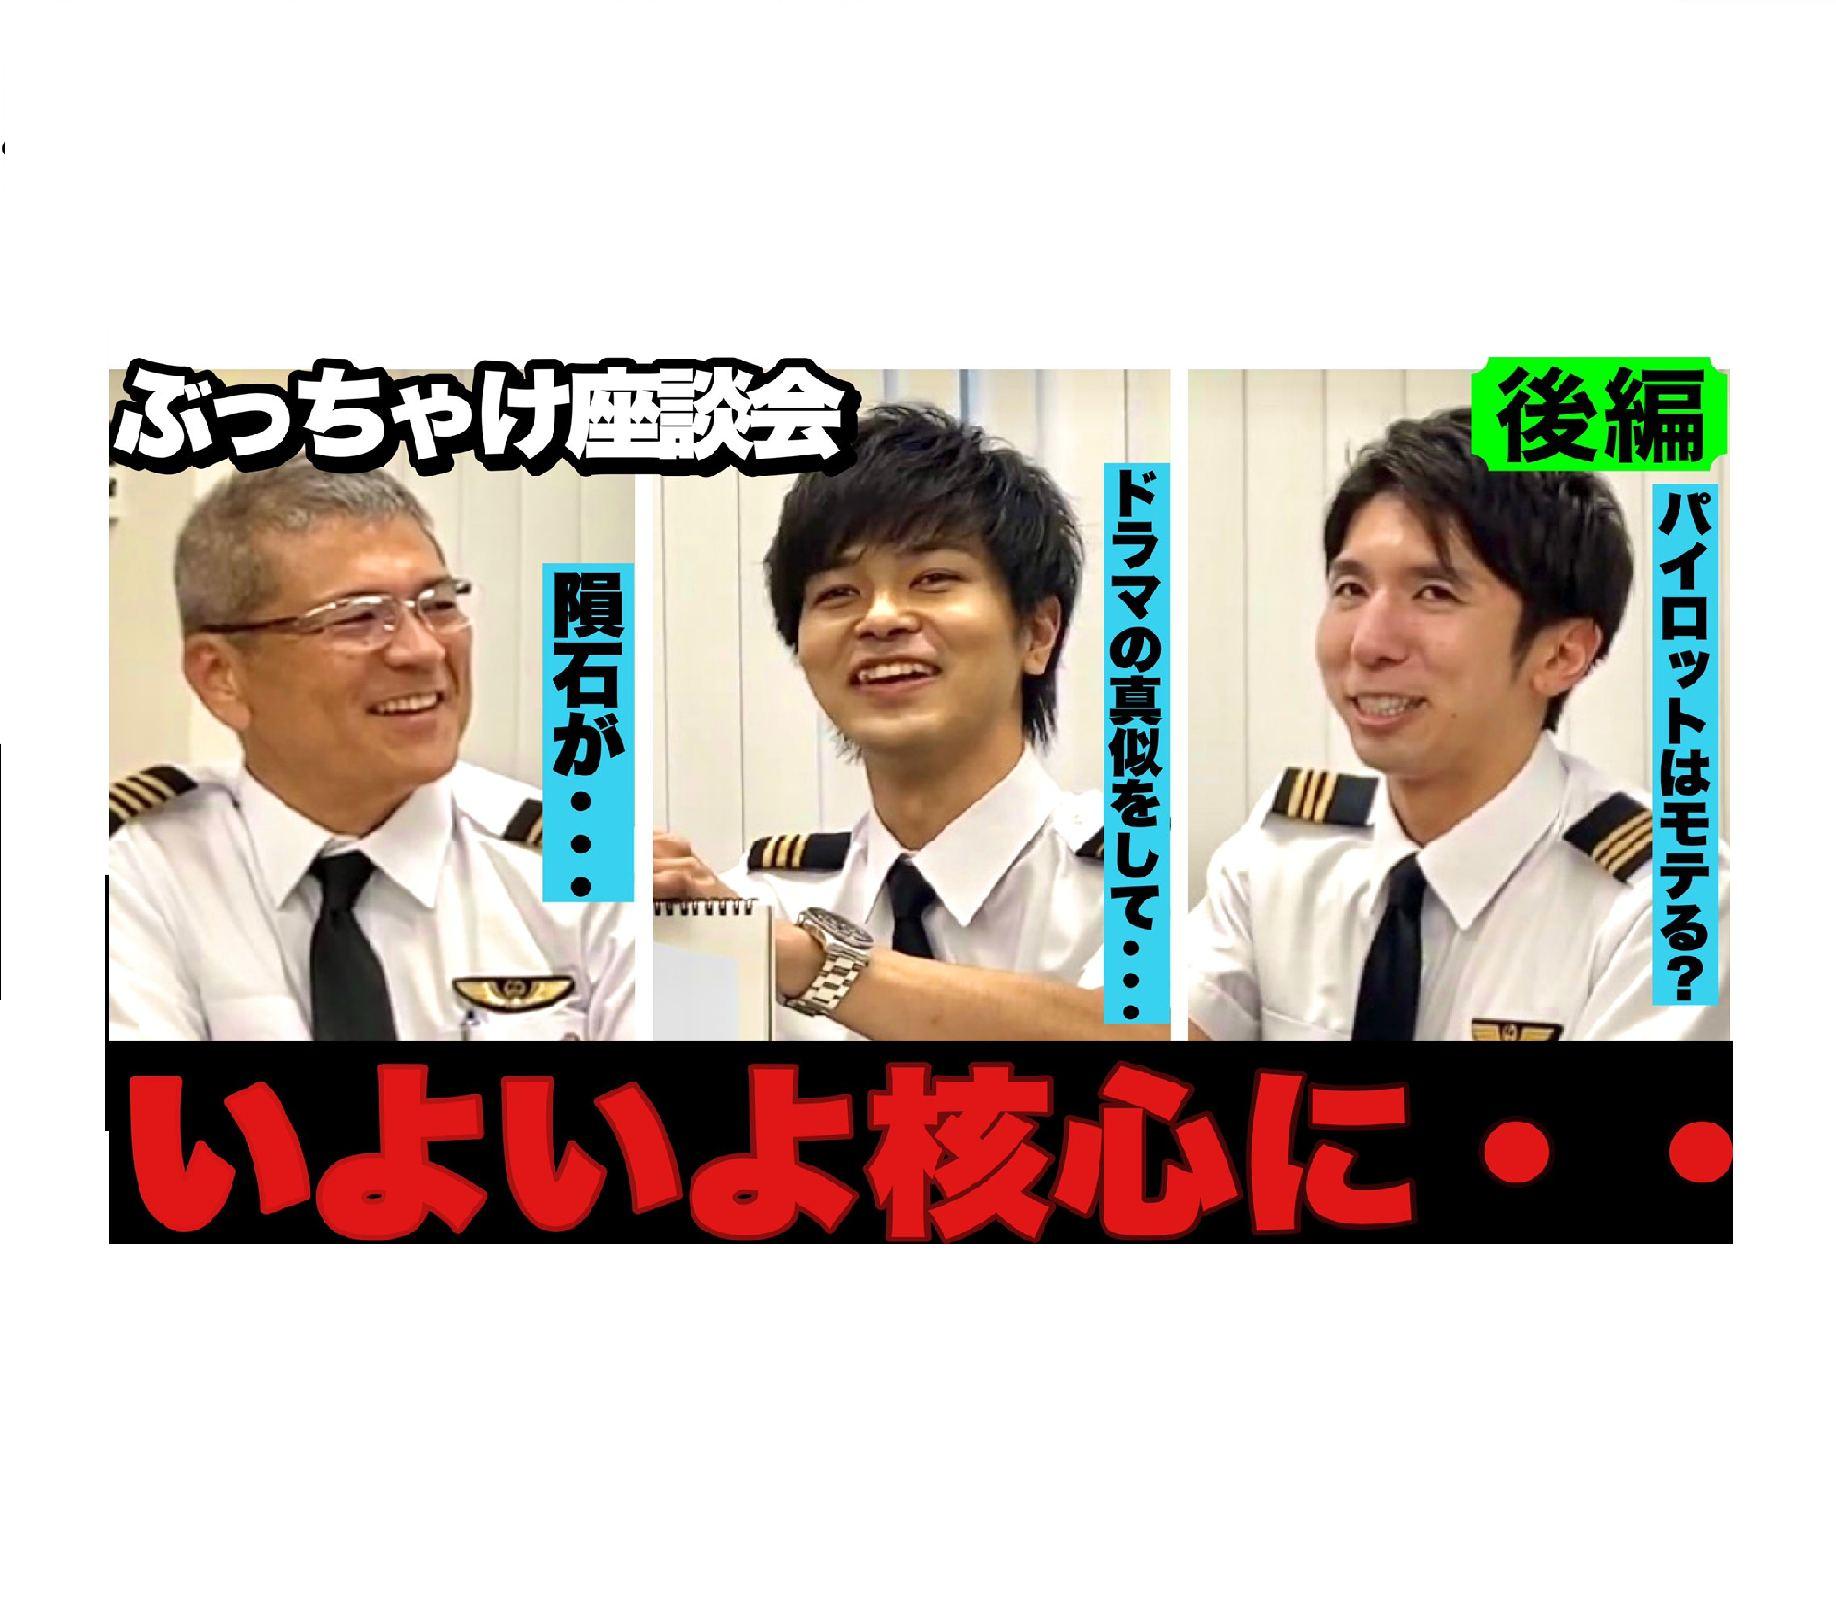 Youtube動画【ぶっちゃけ対談】JTAパイロット座談会!(後編) 【日本トランスオーシャン航空】